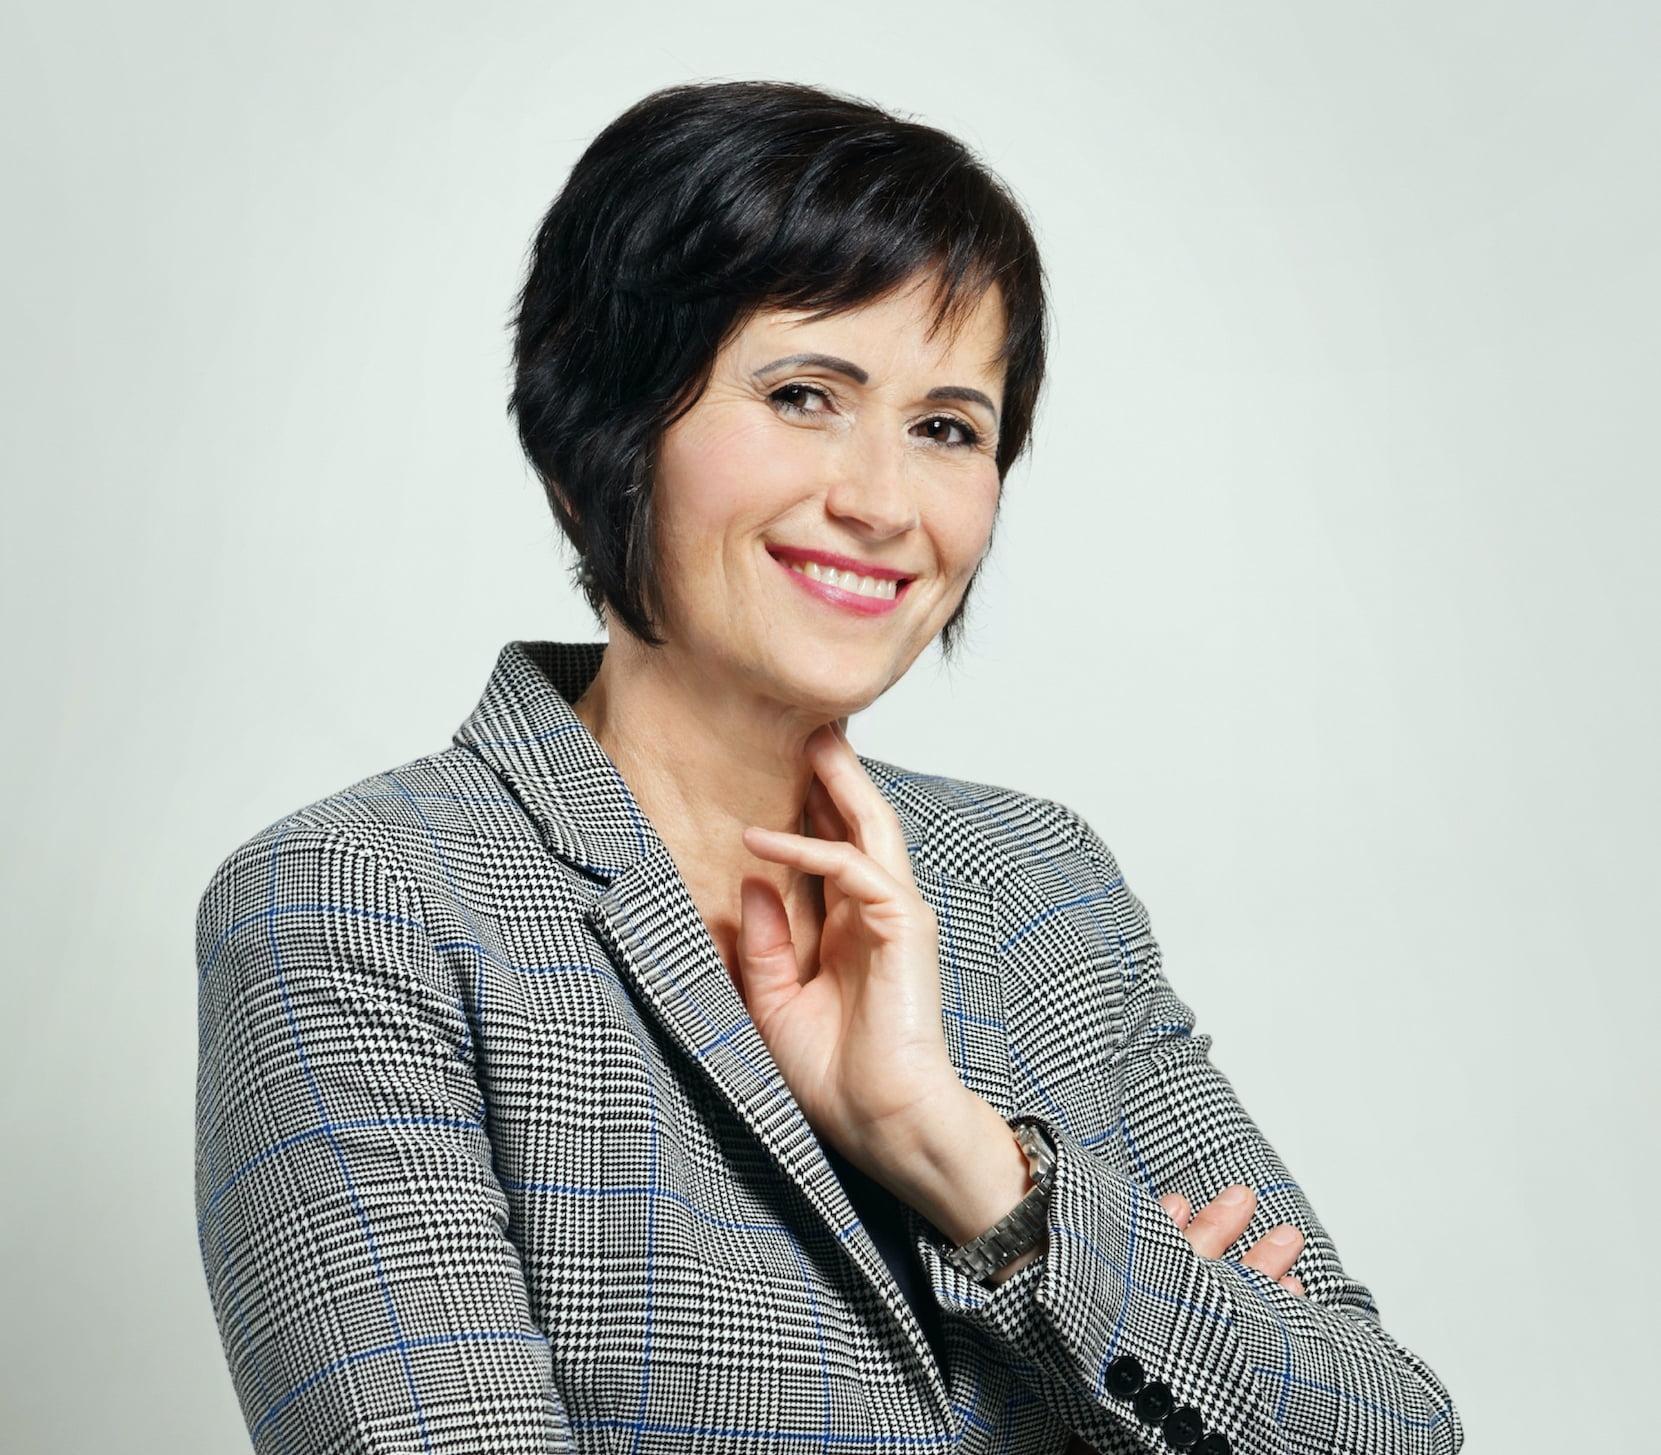 Zuzana Kocúrková, PCC